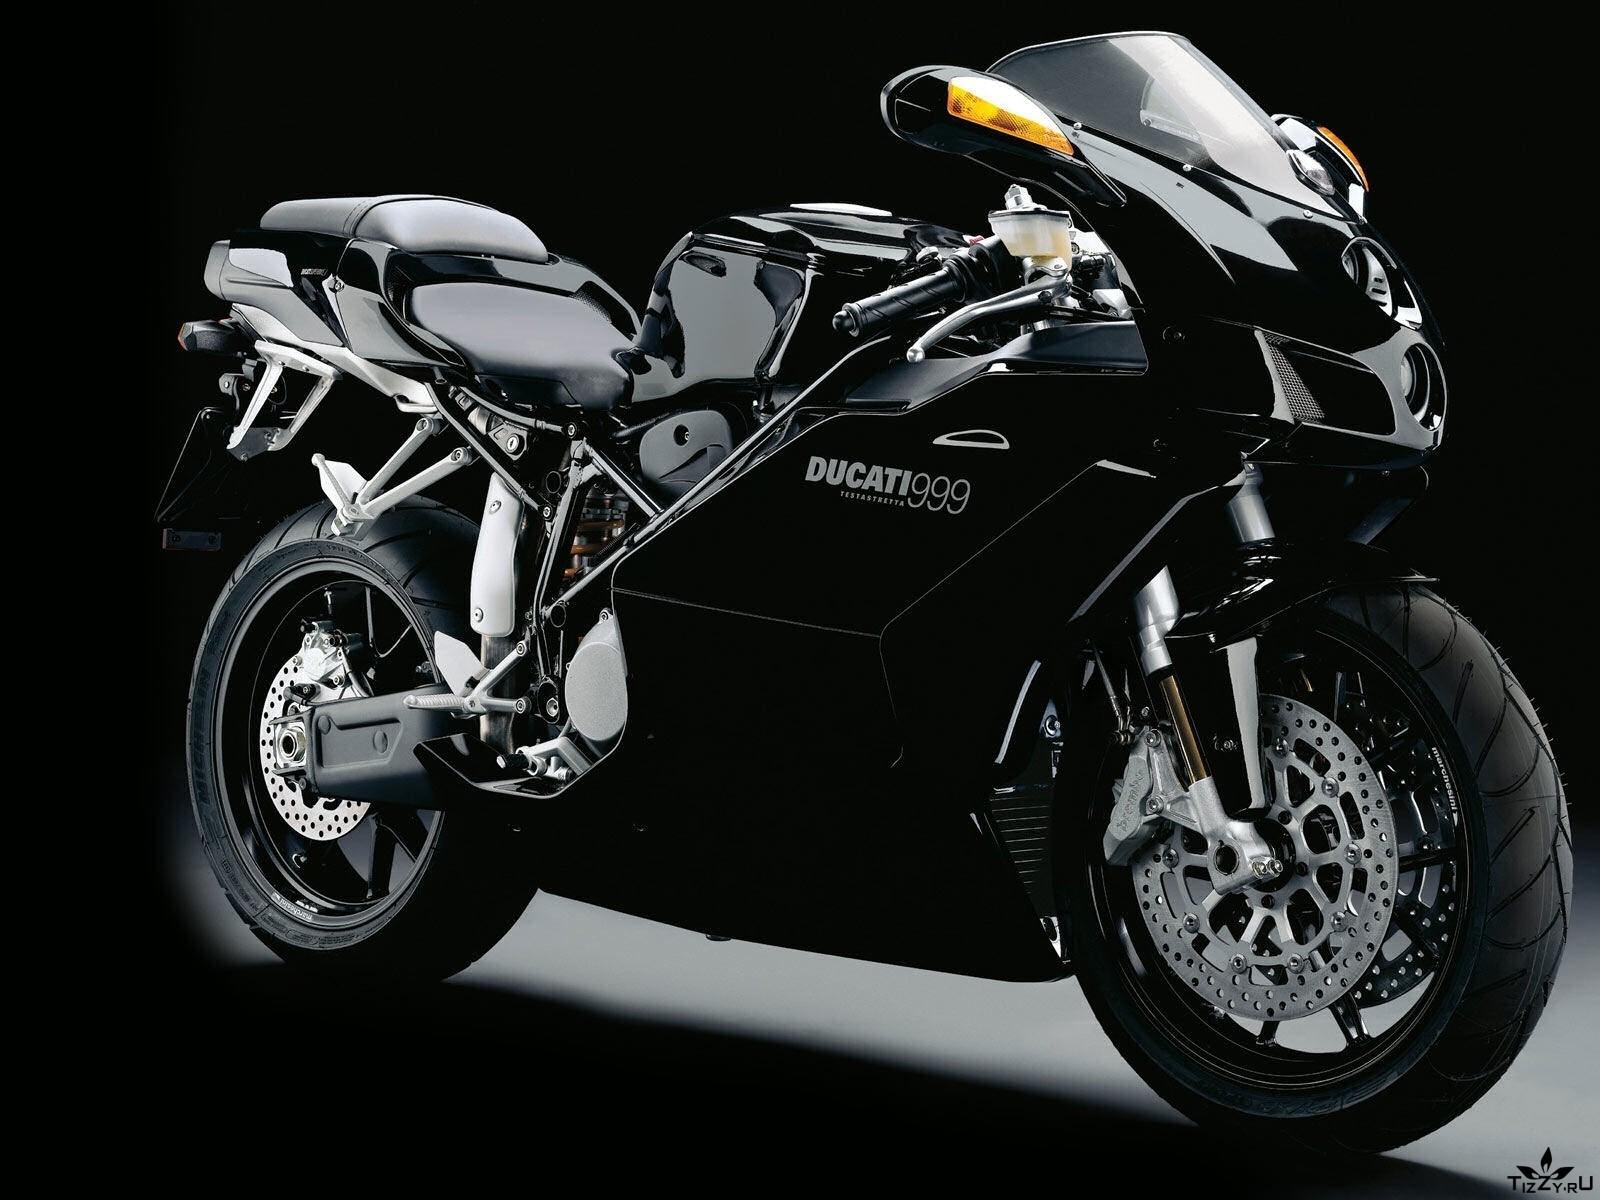 1536 скачать обои Транспорт, Мотоциклы, Дукати (Ducati) - заставки и картинки бесплатно